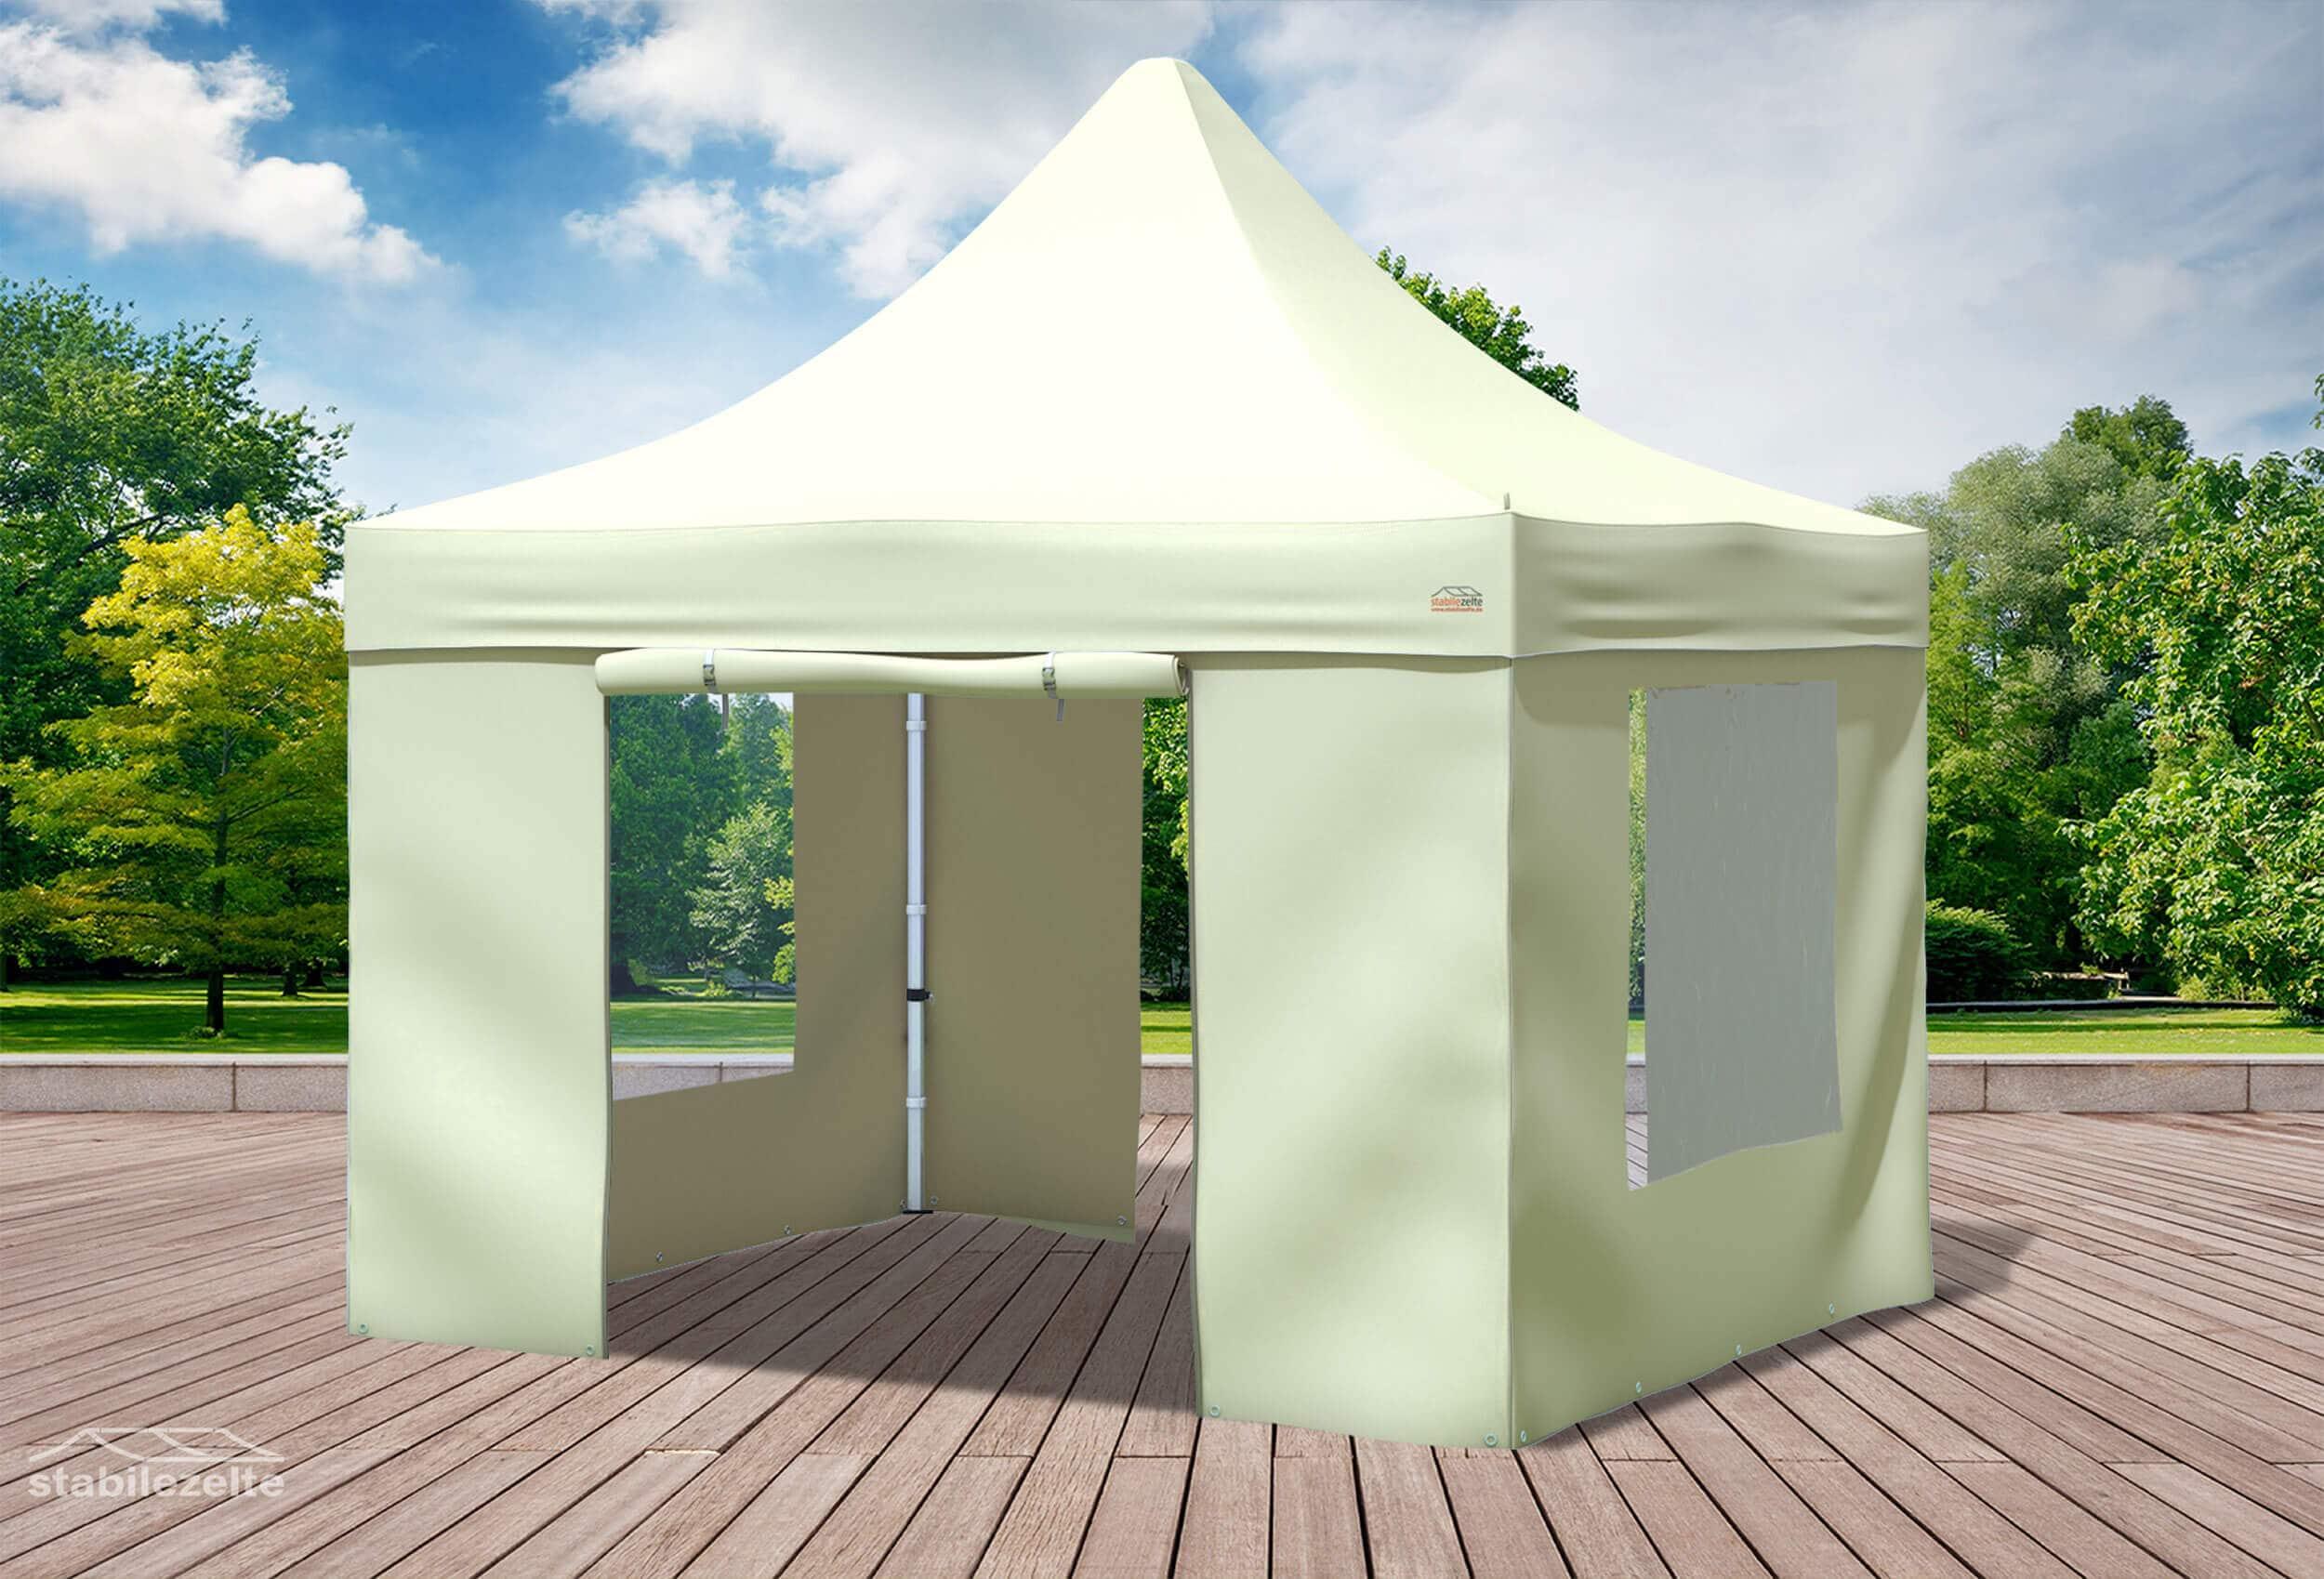 3x3 m faltpavillon beige professional serie faltpavillons. Black Bedroom Furniture Sets. Home Design Ideas